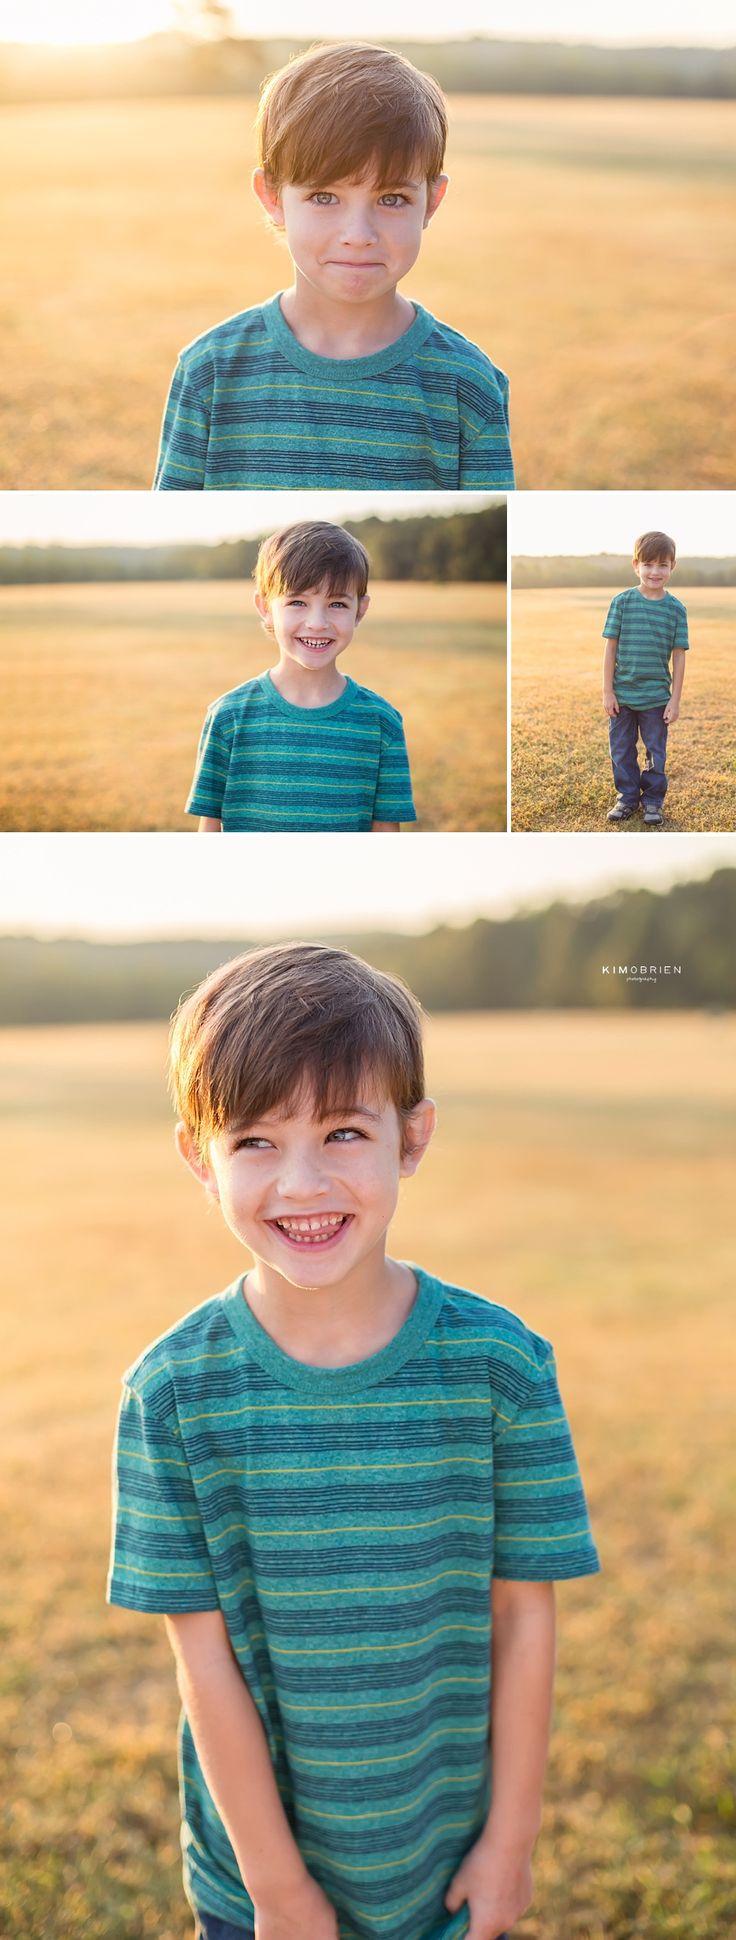 fine art portrait photography. Such a cute six year old boy